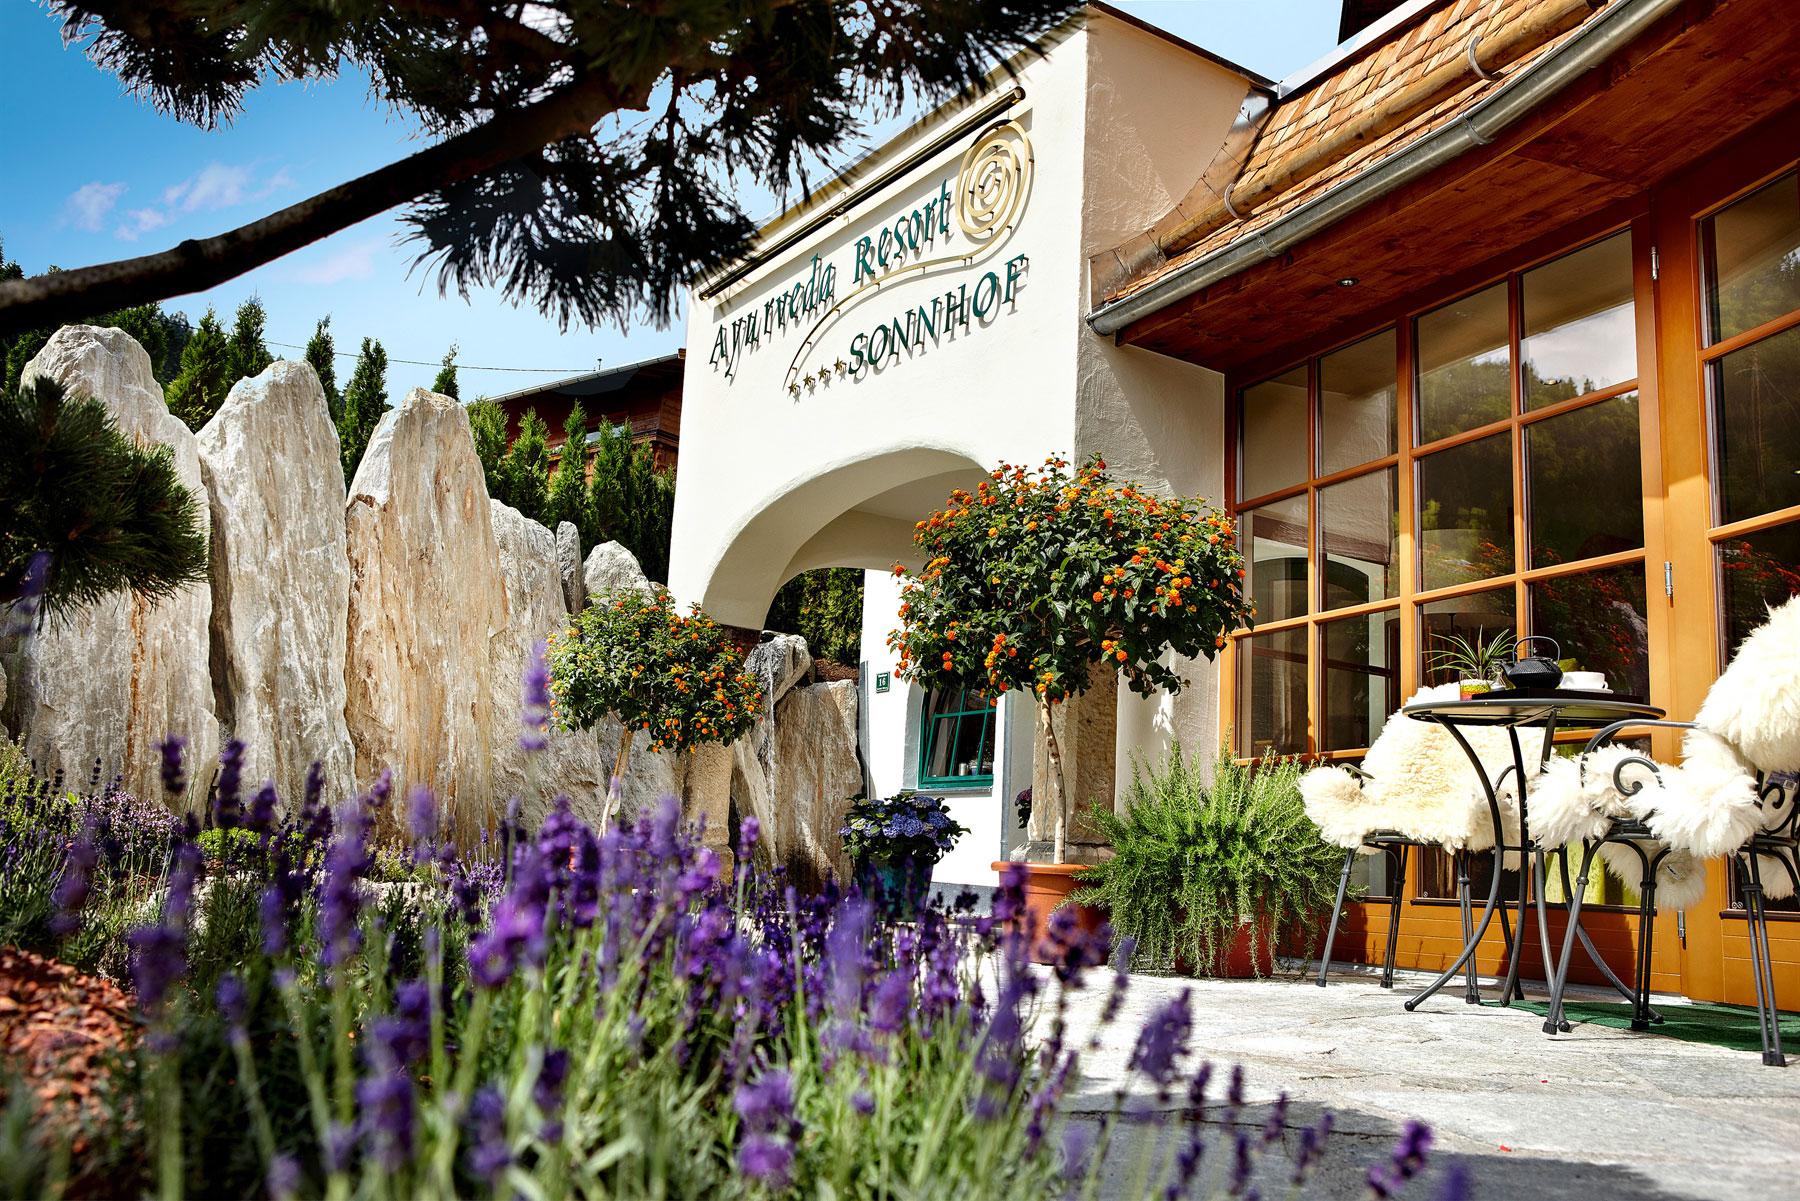 Luxury for the Mind, Body and Spirit at Austria's Ayurvedic Resort Sonnhof 6